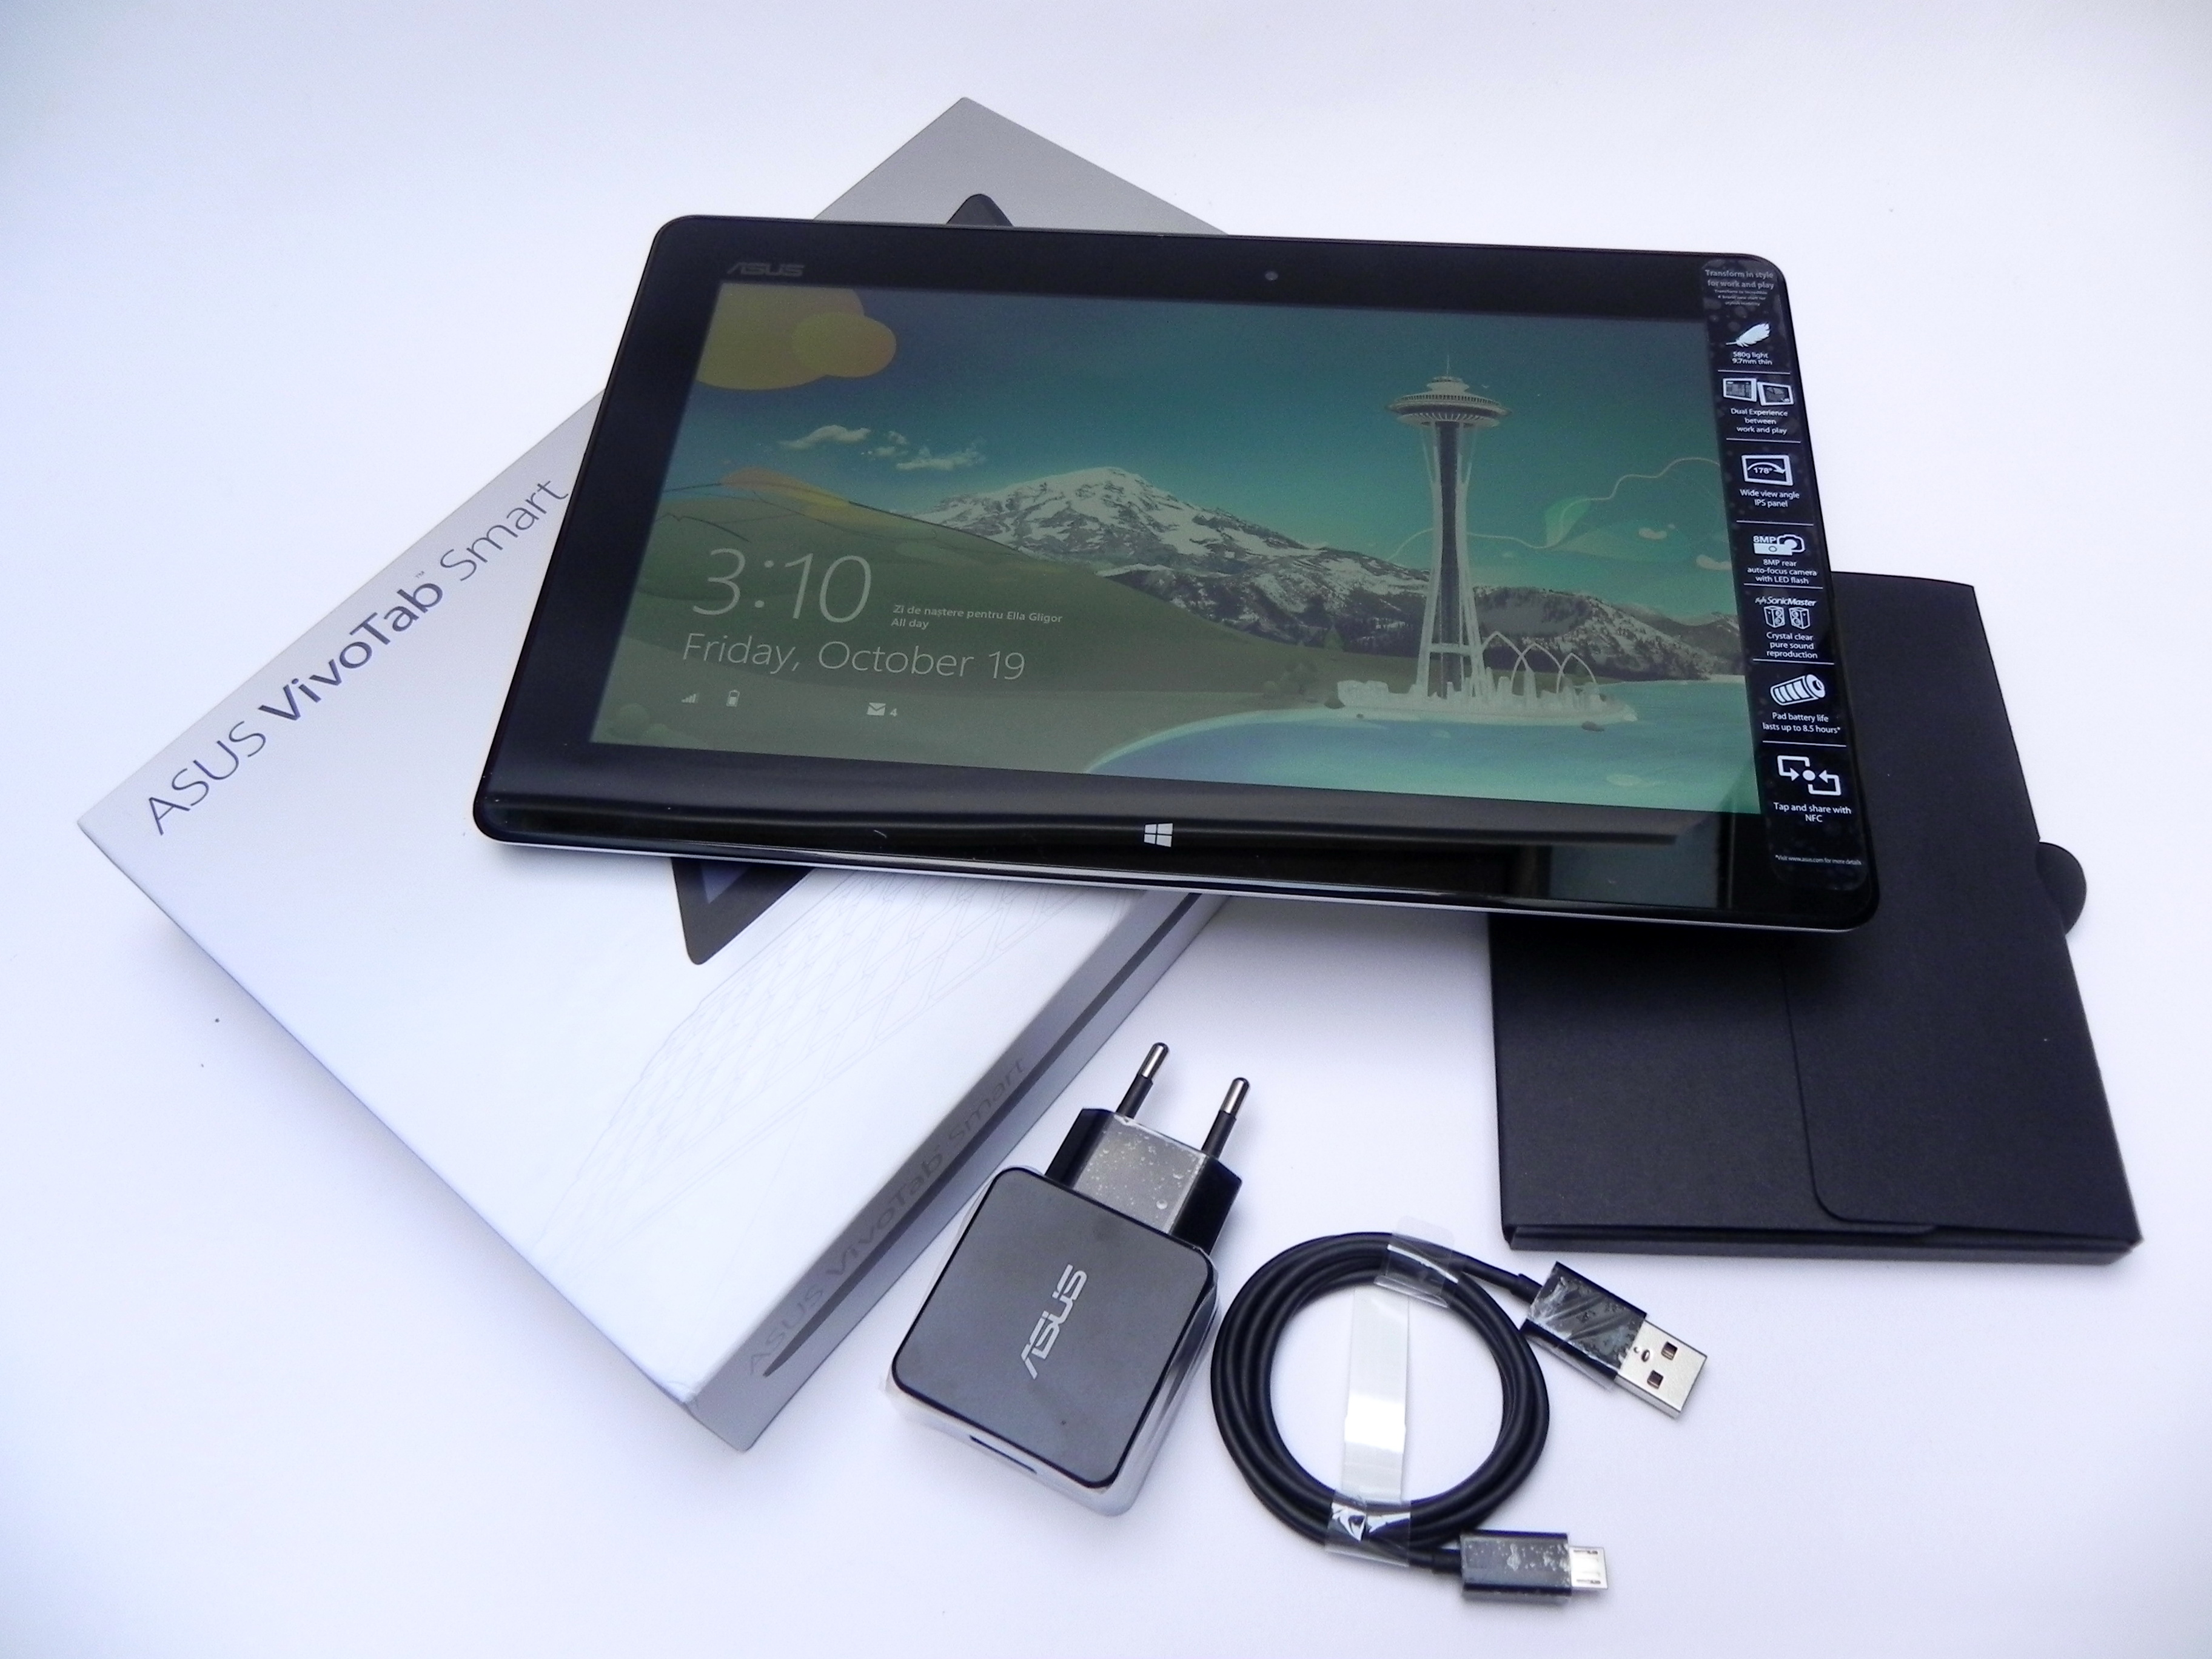 ASUS VivoTab Smart Unboxing: Intel Atom Win 8 Tablet Gets